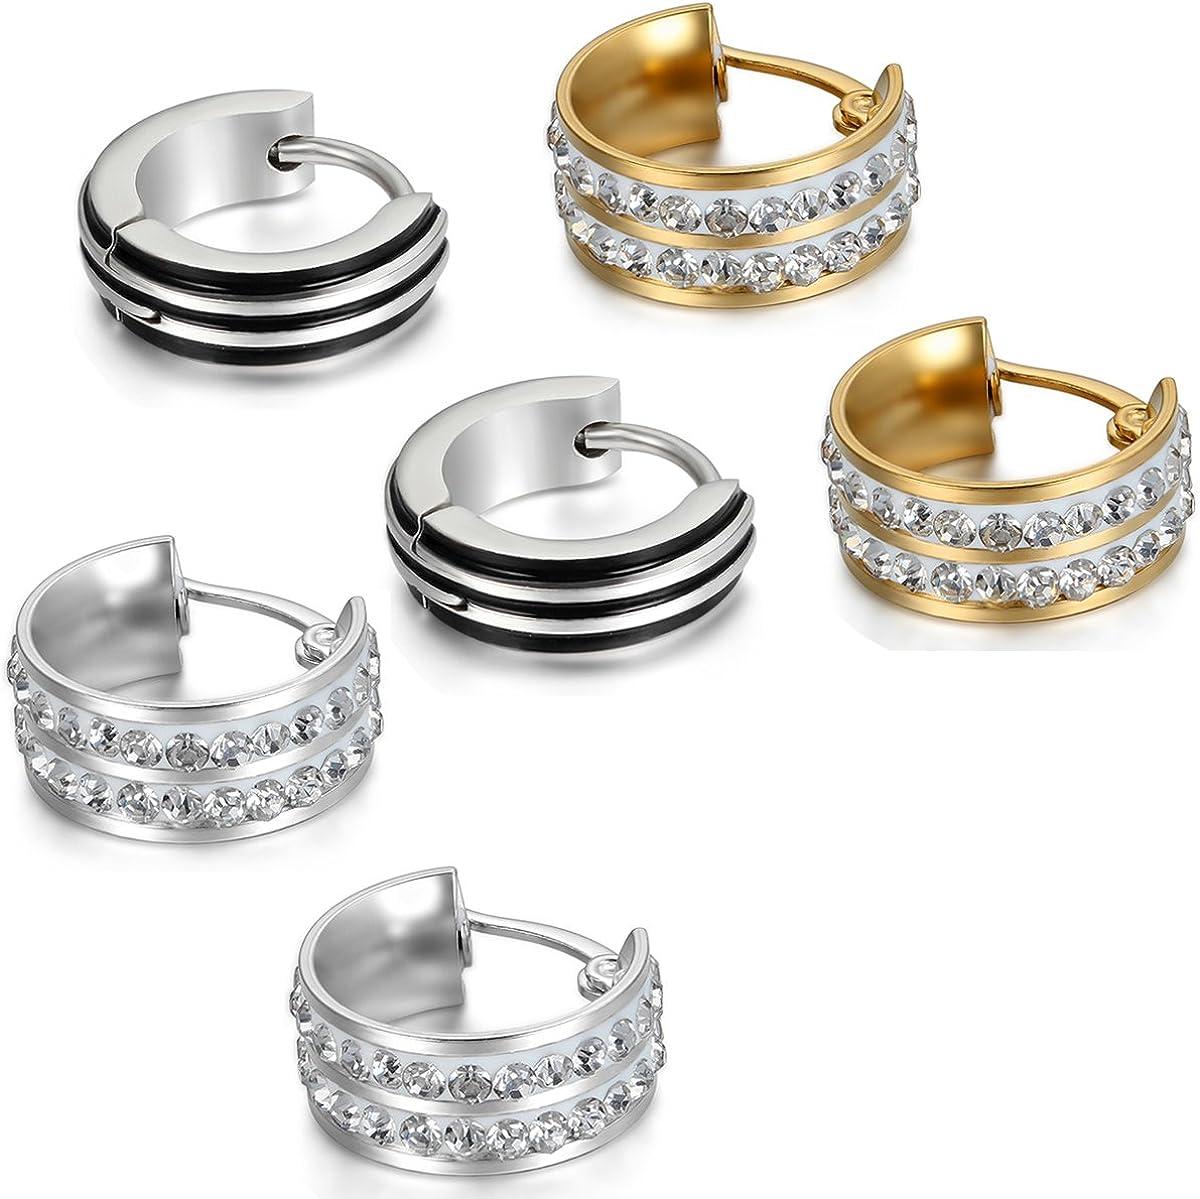 Aroncent Stainless Steel Unique Small Hoop Earrings for Men 3 Pairs Huggie Earrings